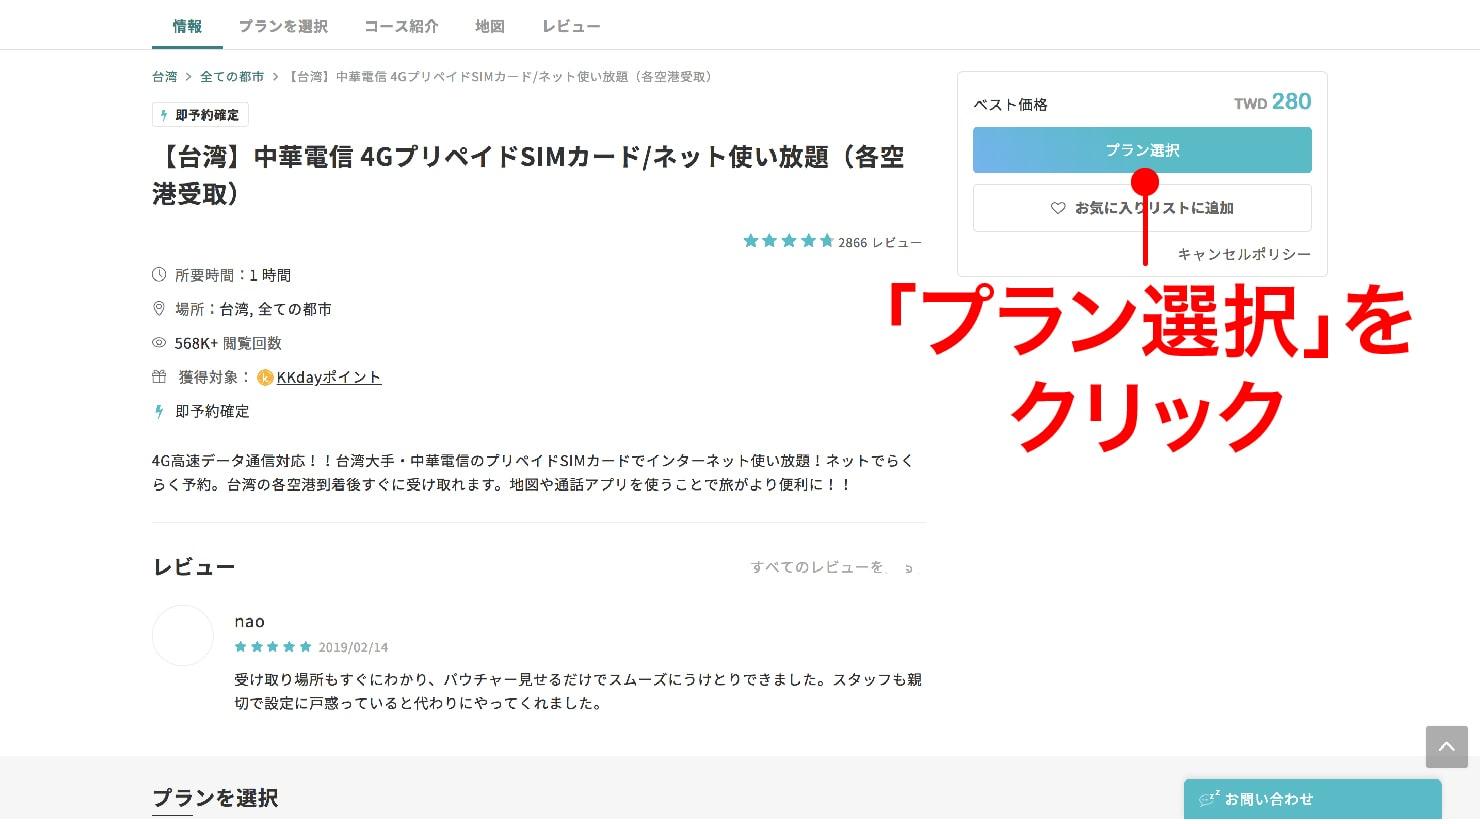 KKdayでの「中華電信プリペイドSIMカード」予約手順_2